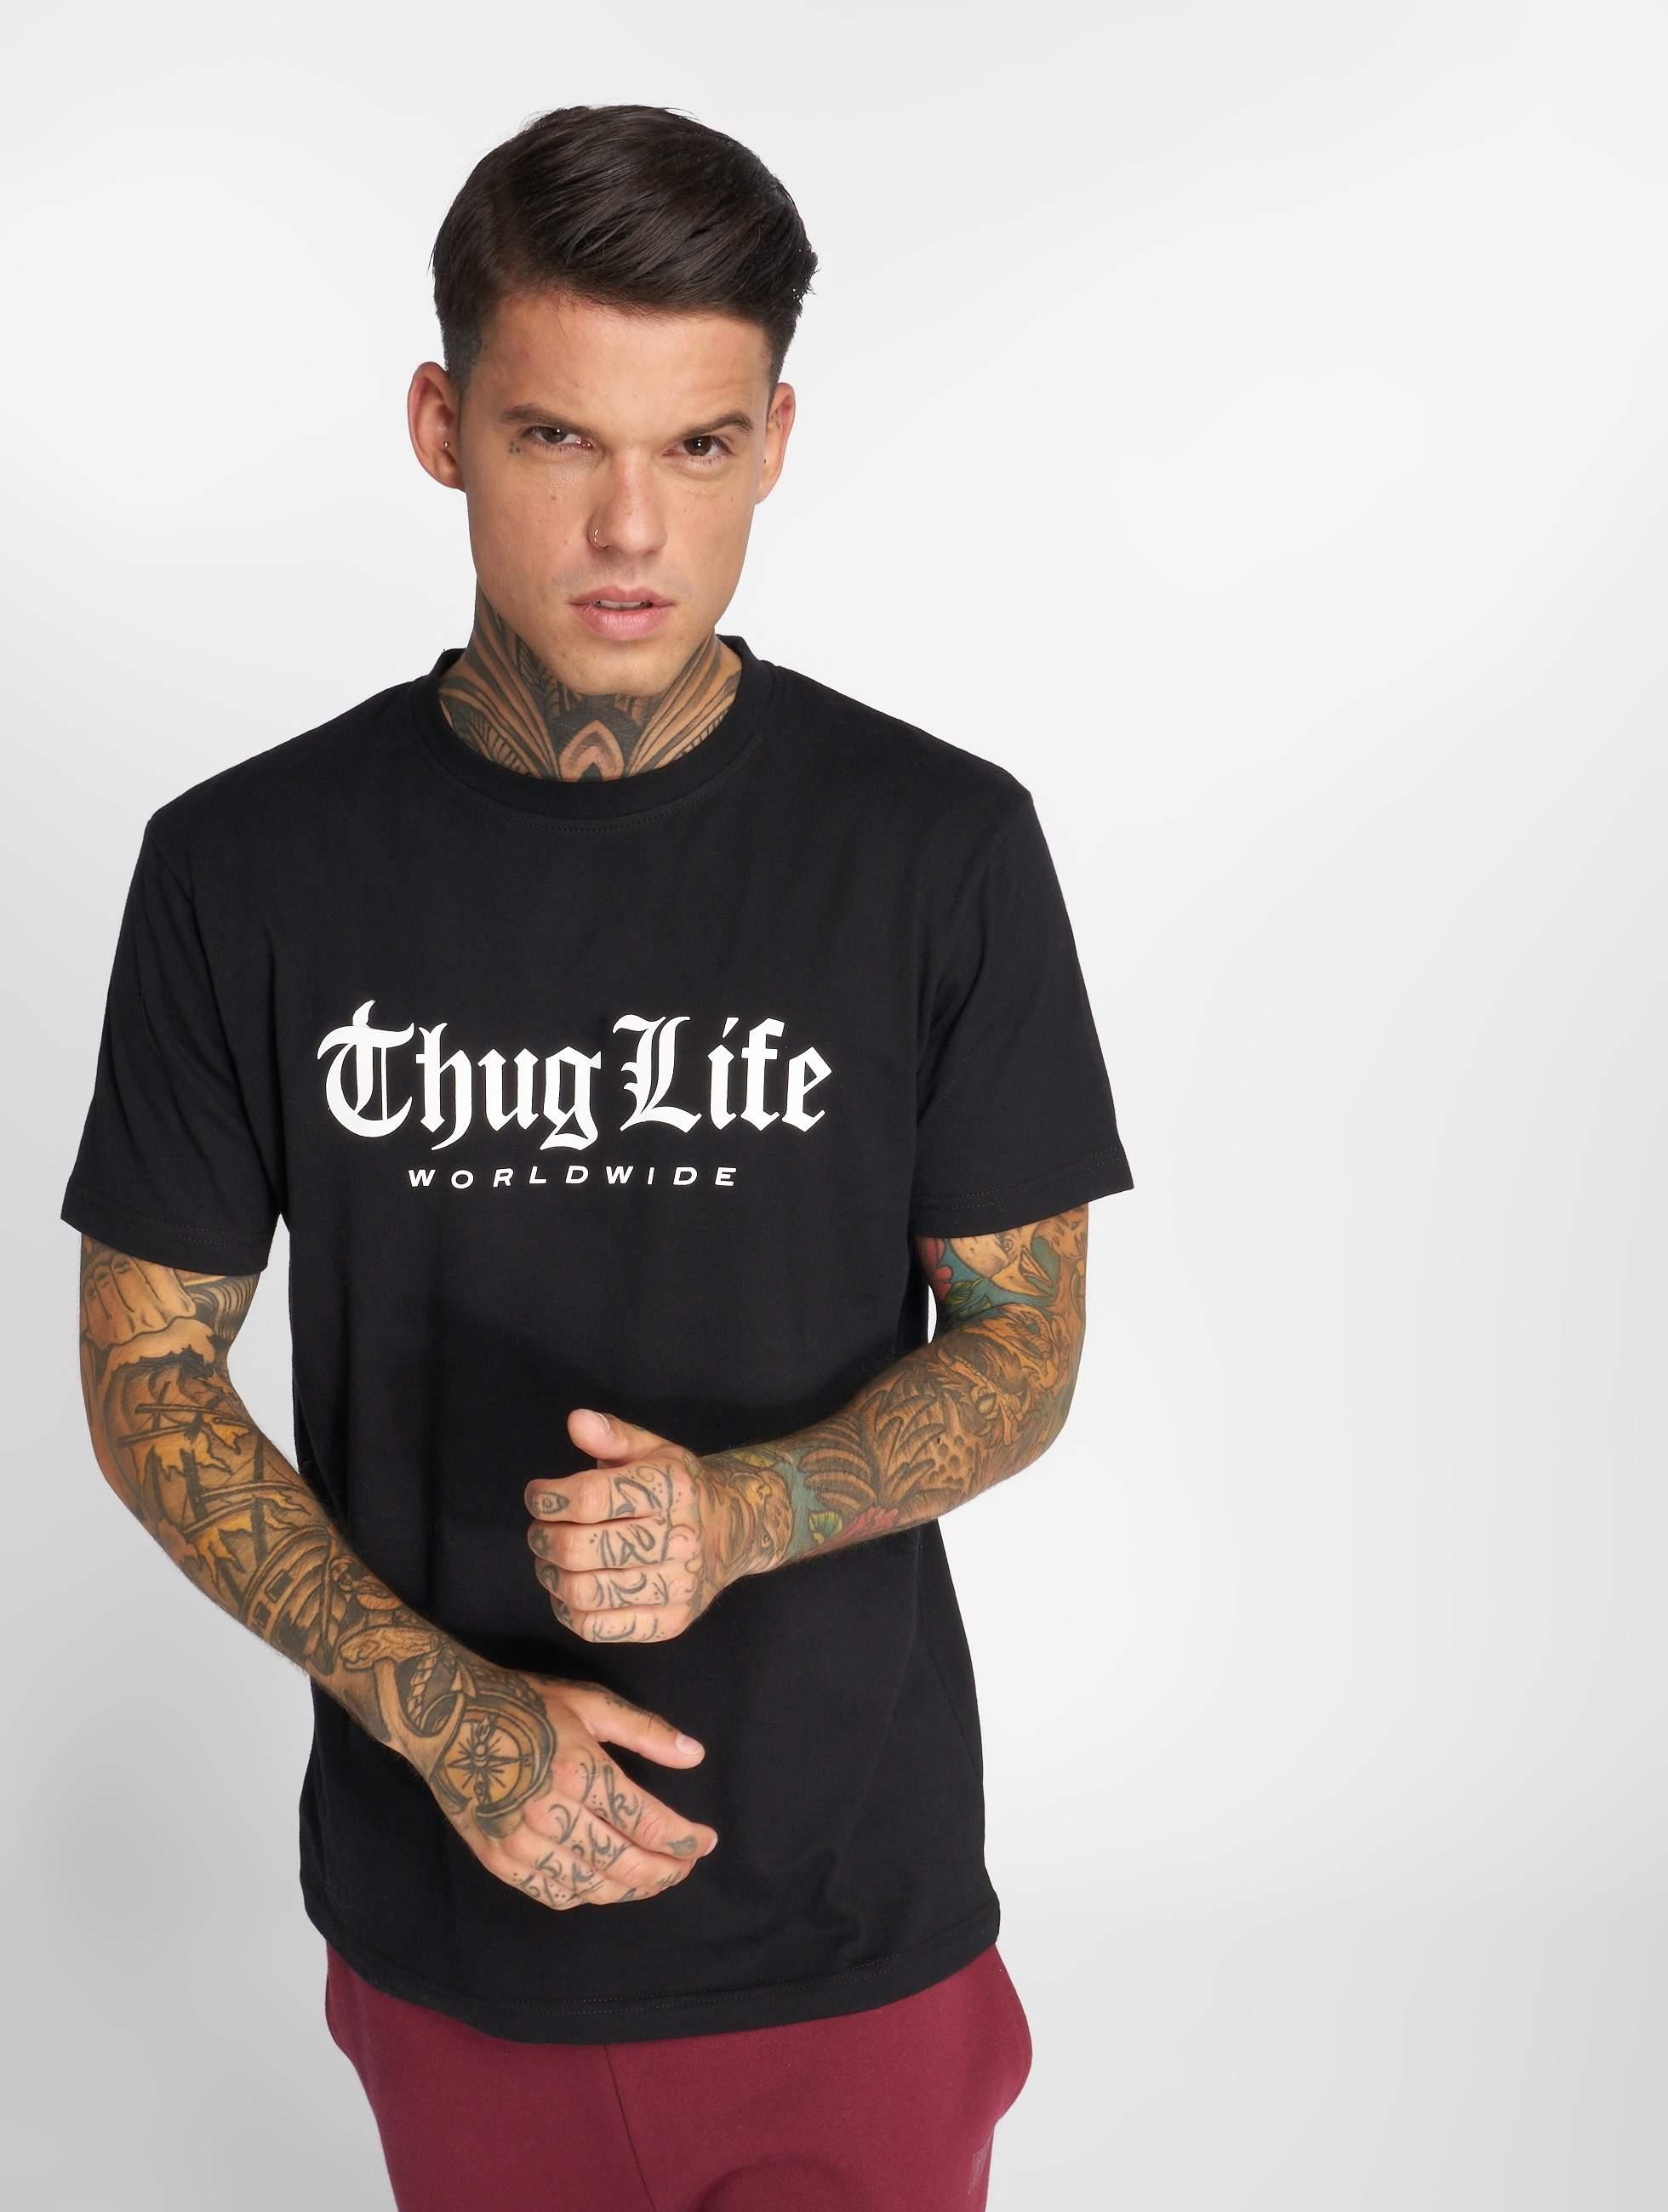 Thug Life / T-Shirt Digital in black XL